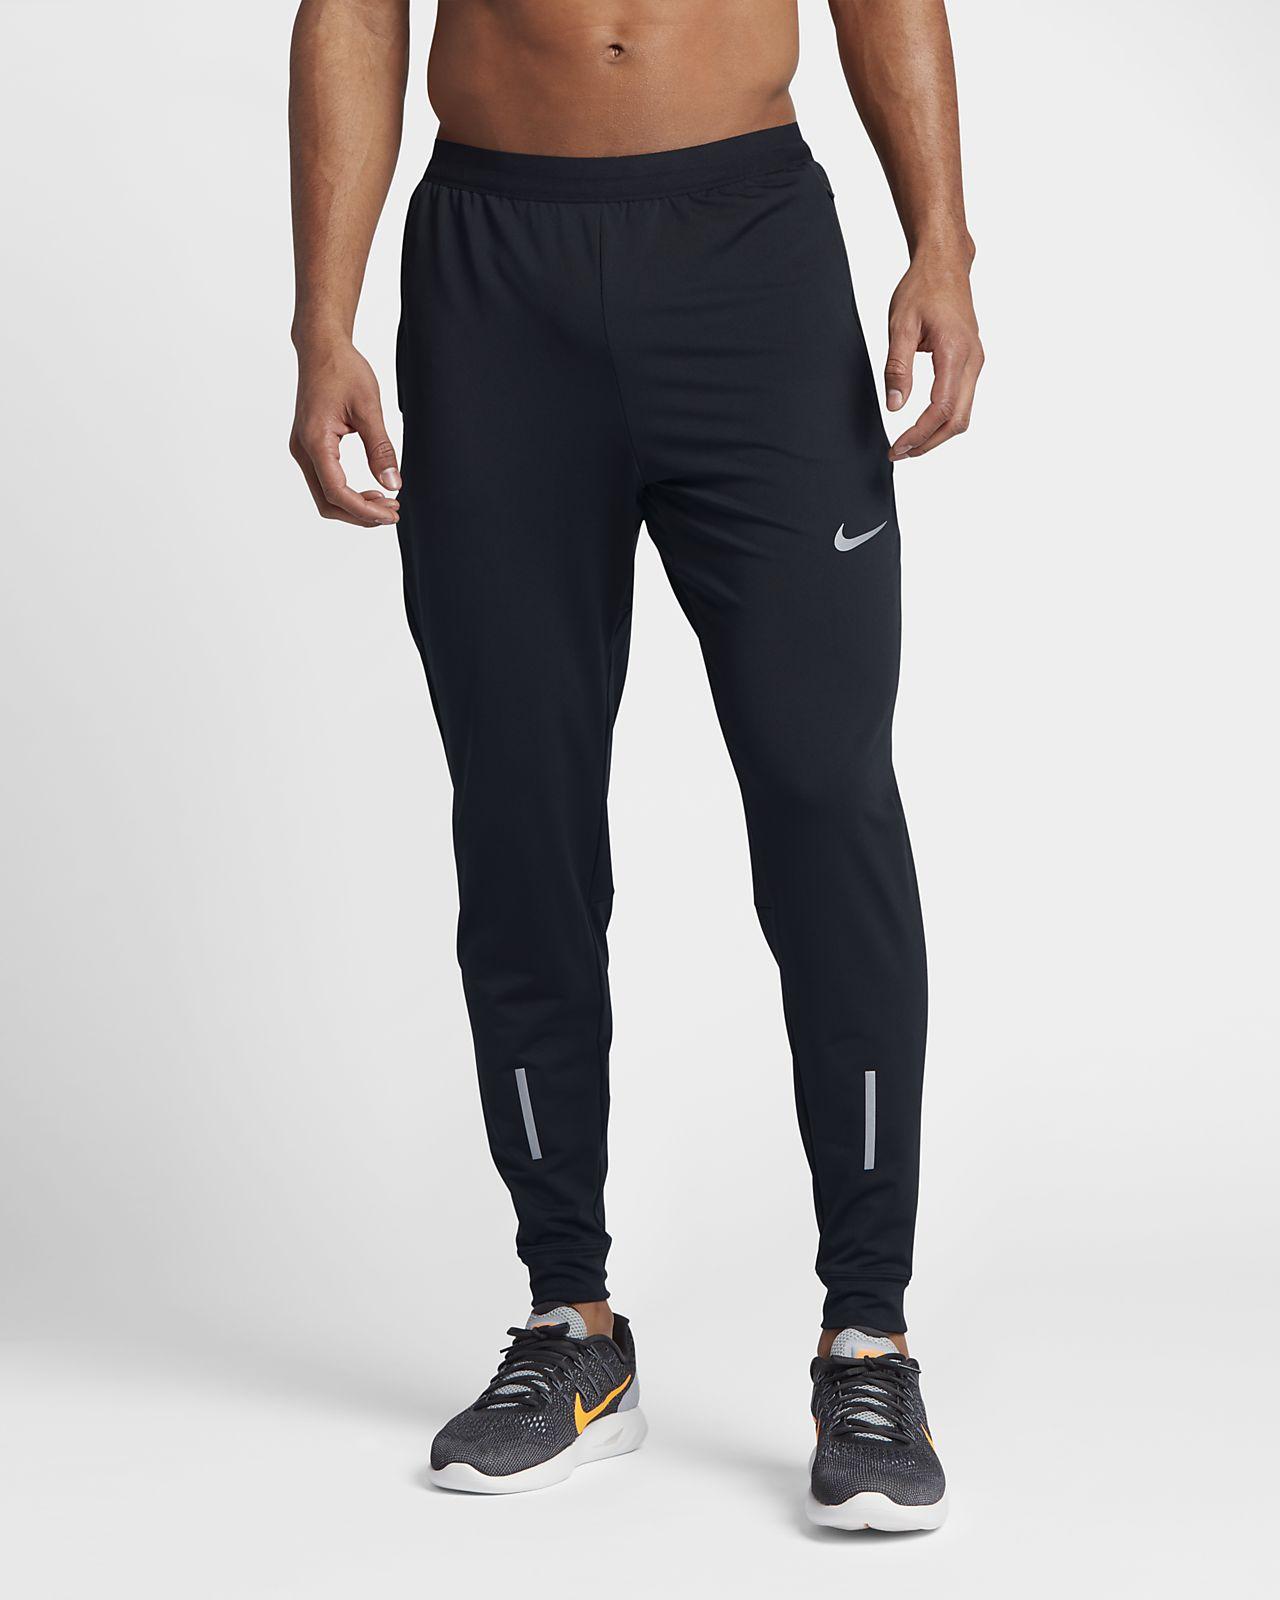 innovative design 3f5ba 1116c Nike Dri-FIT Phenom Men s 27